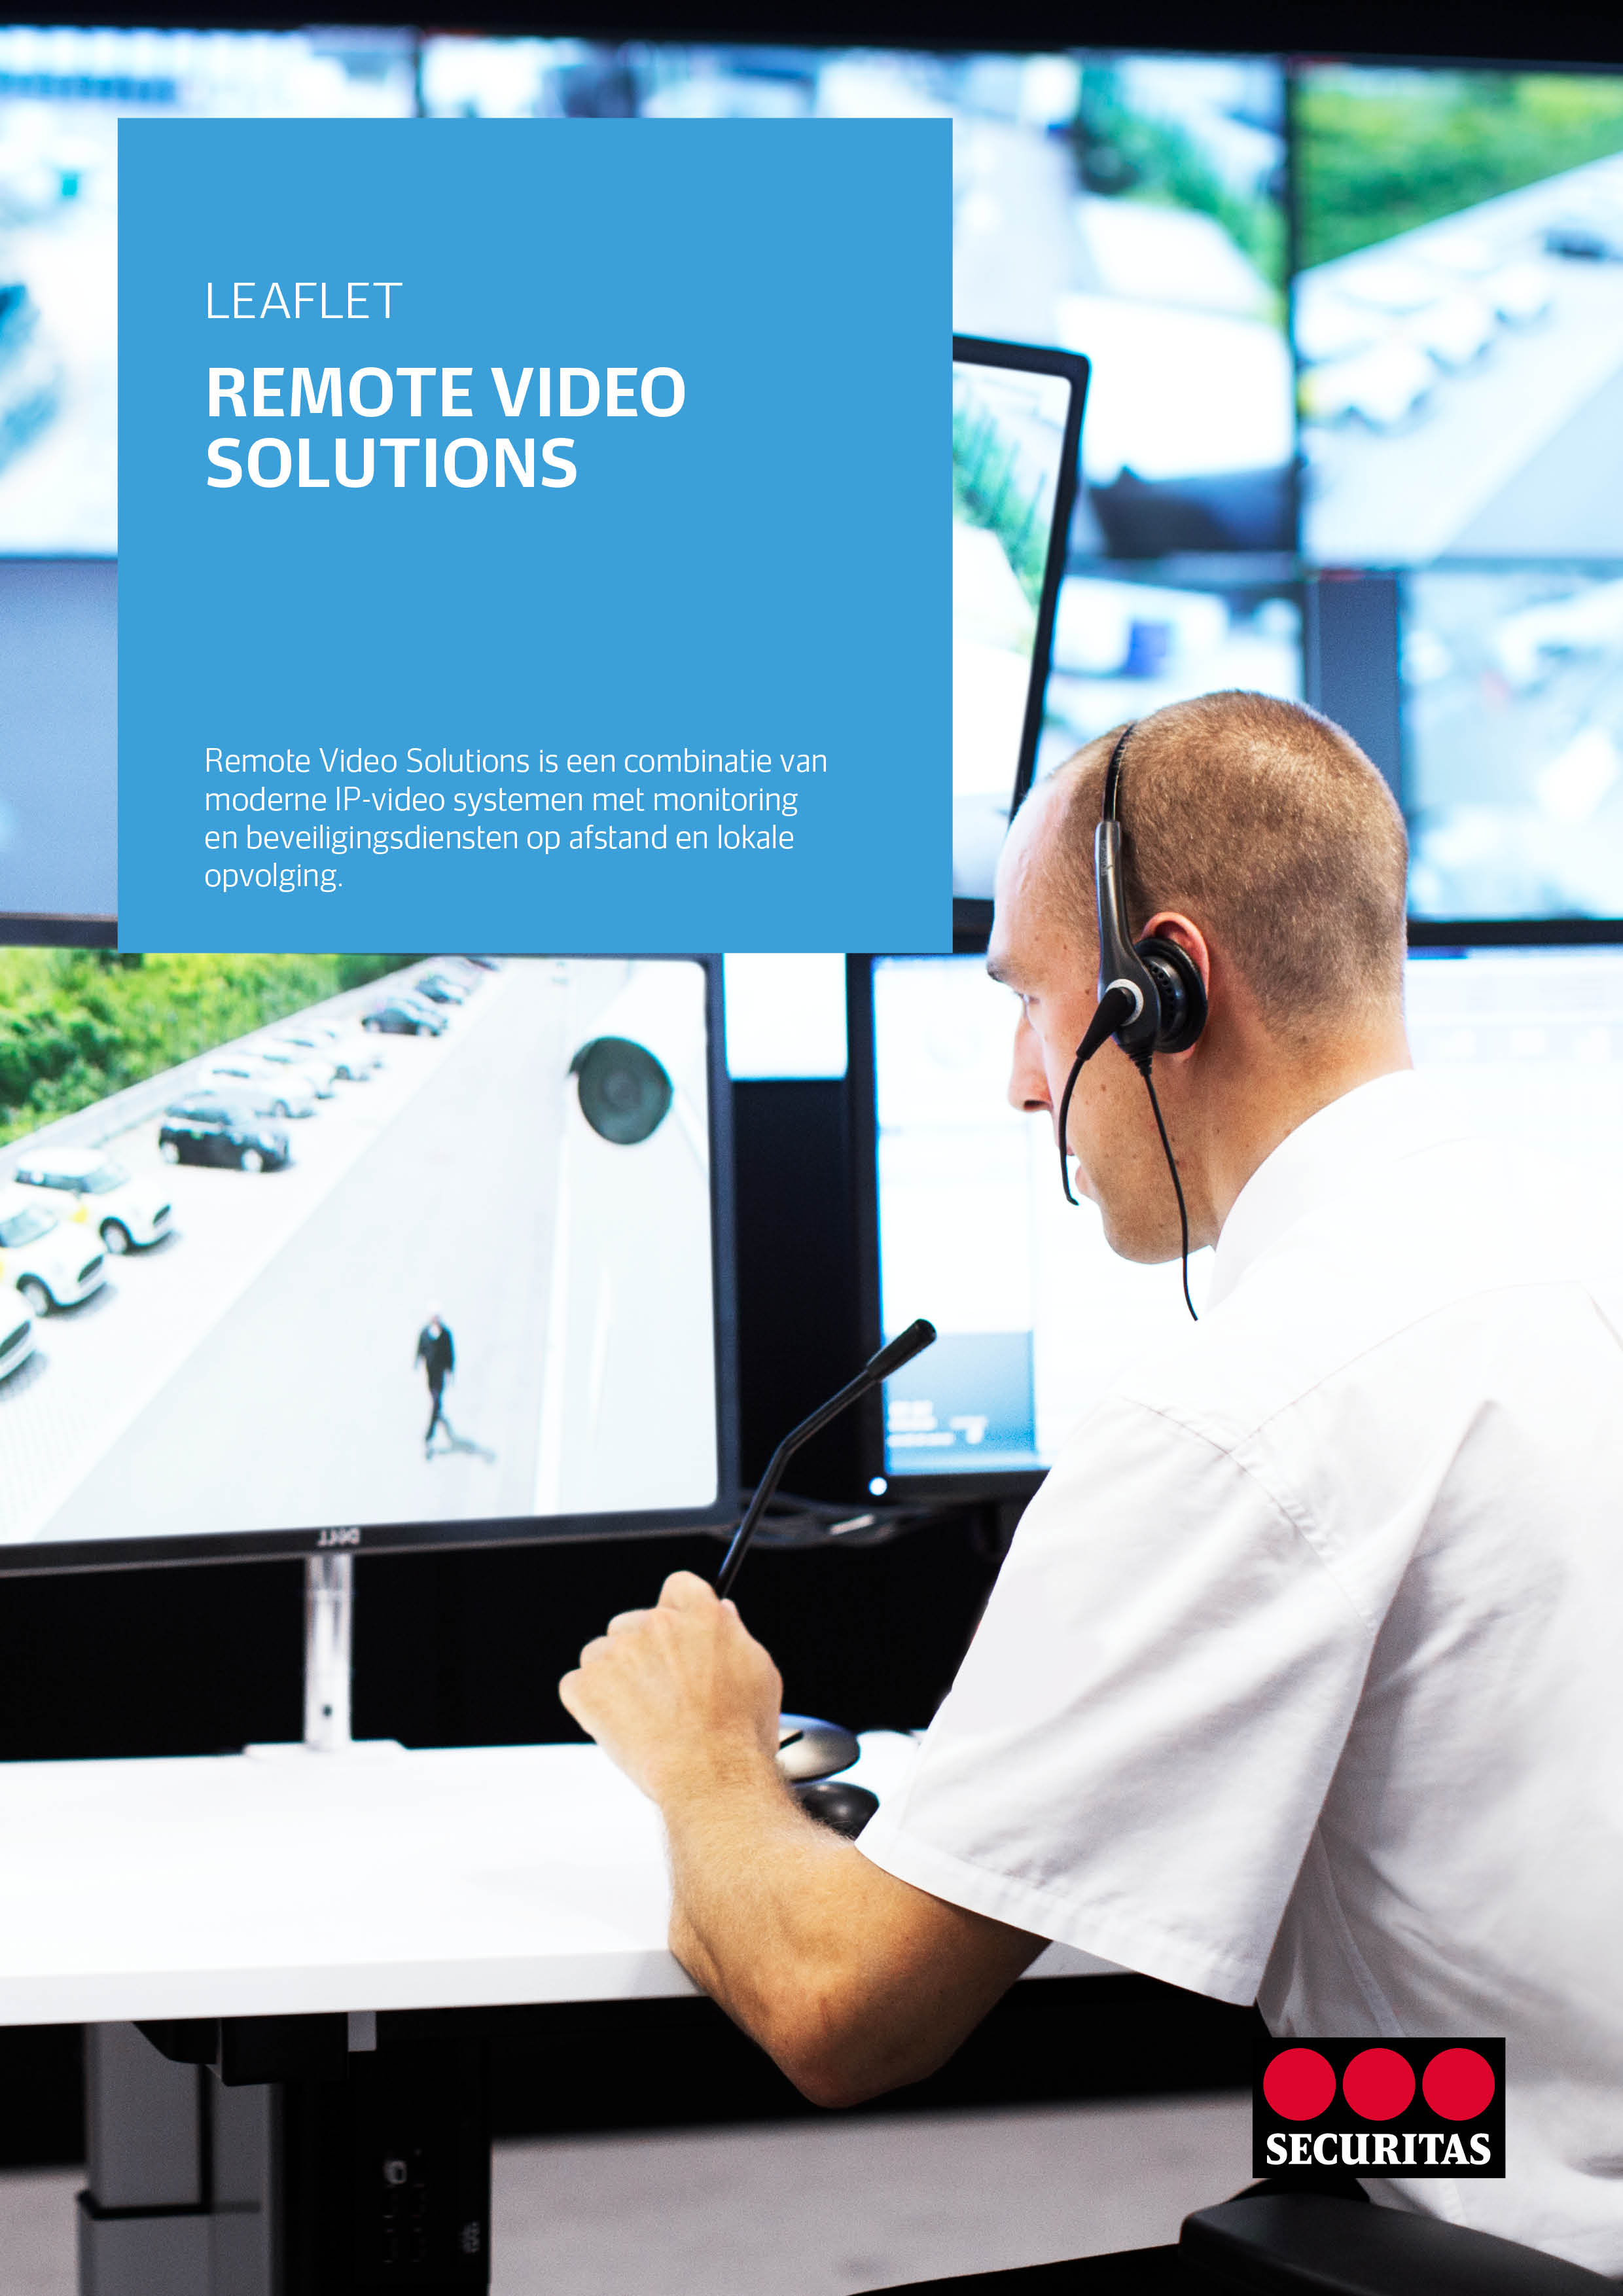 leaflet remote video solutions.jpg